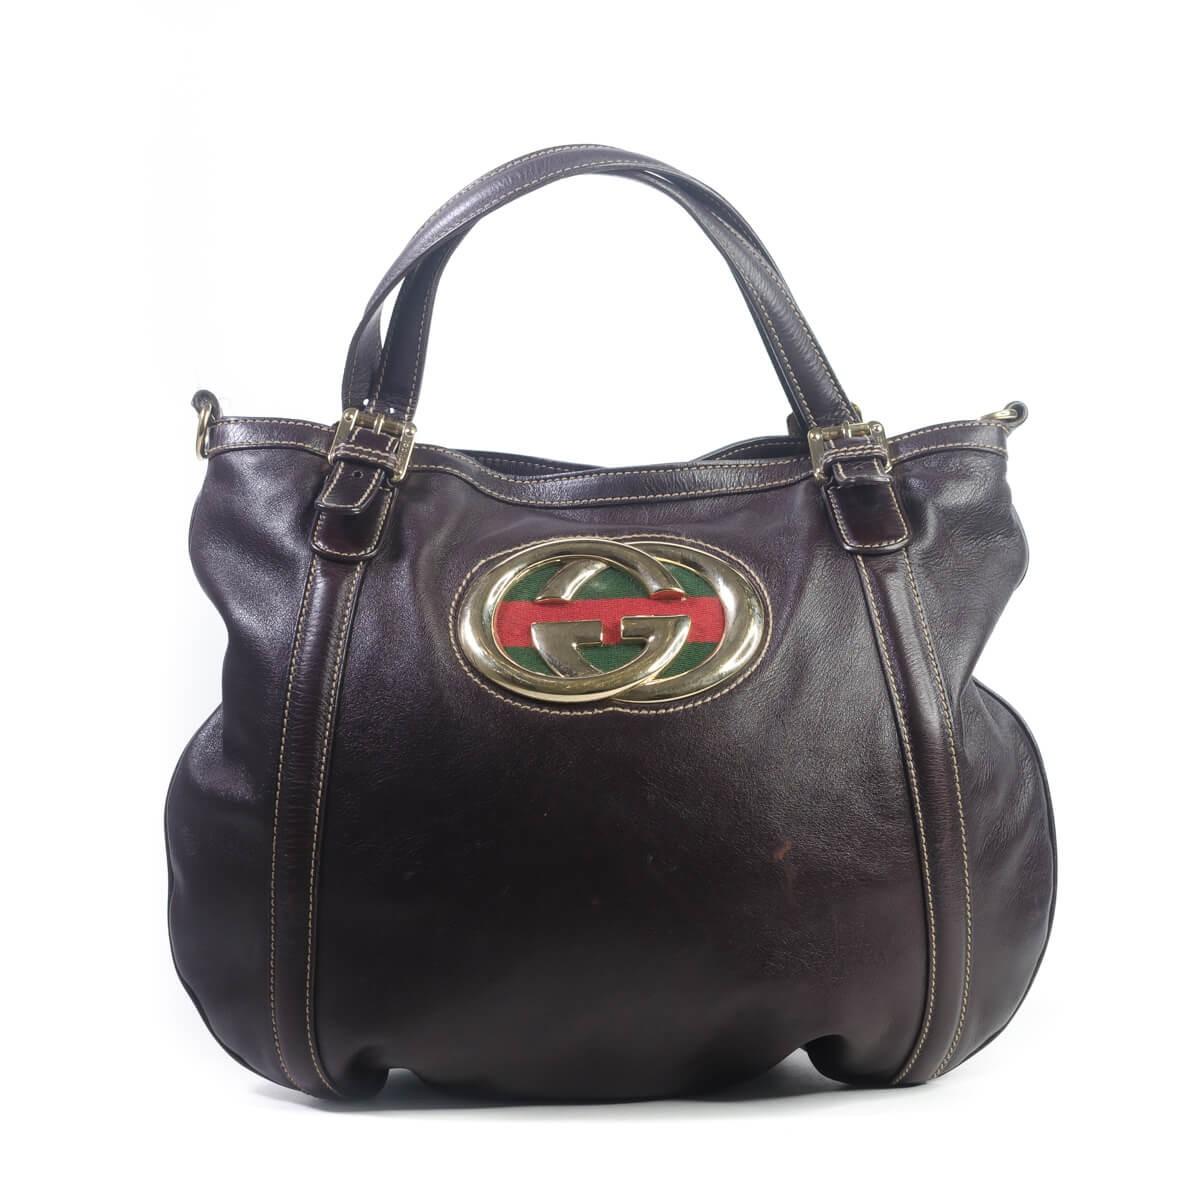 a7c8e2991ef Gucci Calfskin Medium Britt Bag Dark Brown